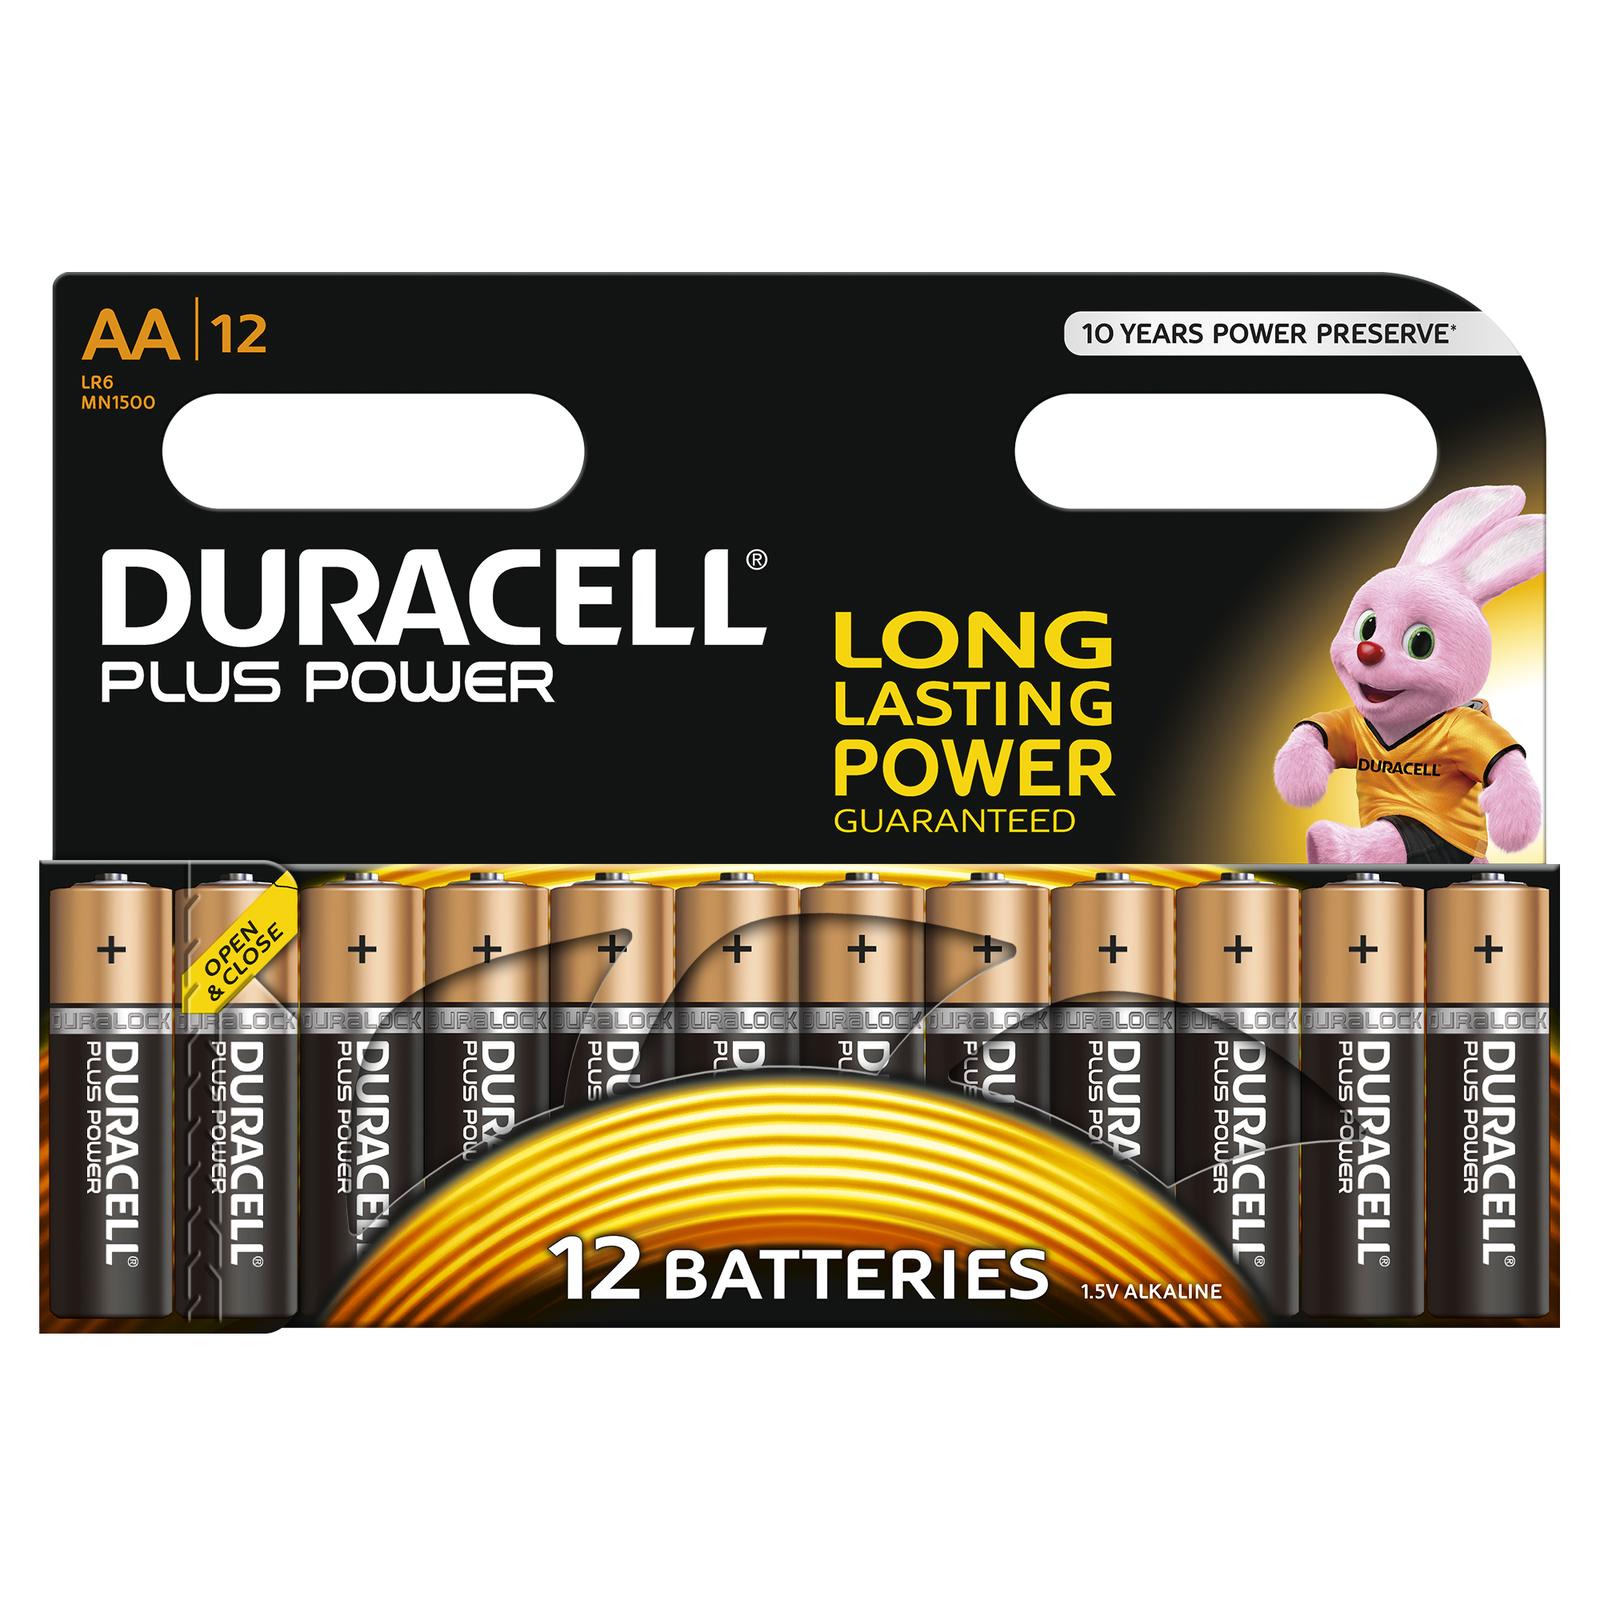 48x Duracell Plus Power  Batterie  AA  LR06  Mignon  MN1500  4x12er Bli.